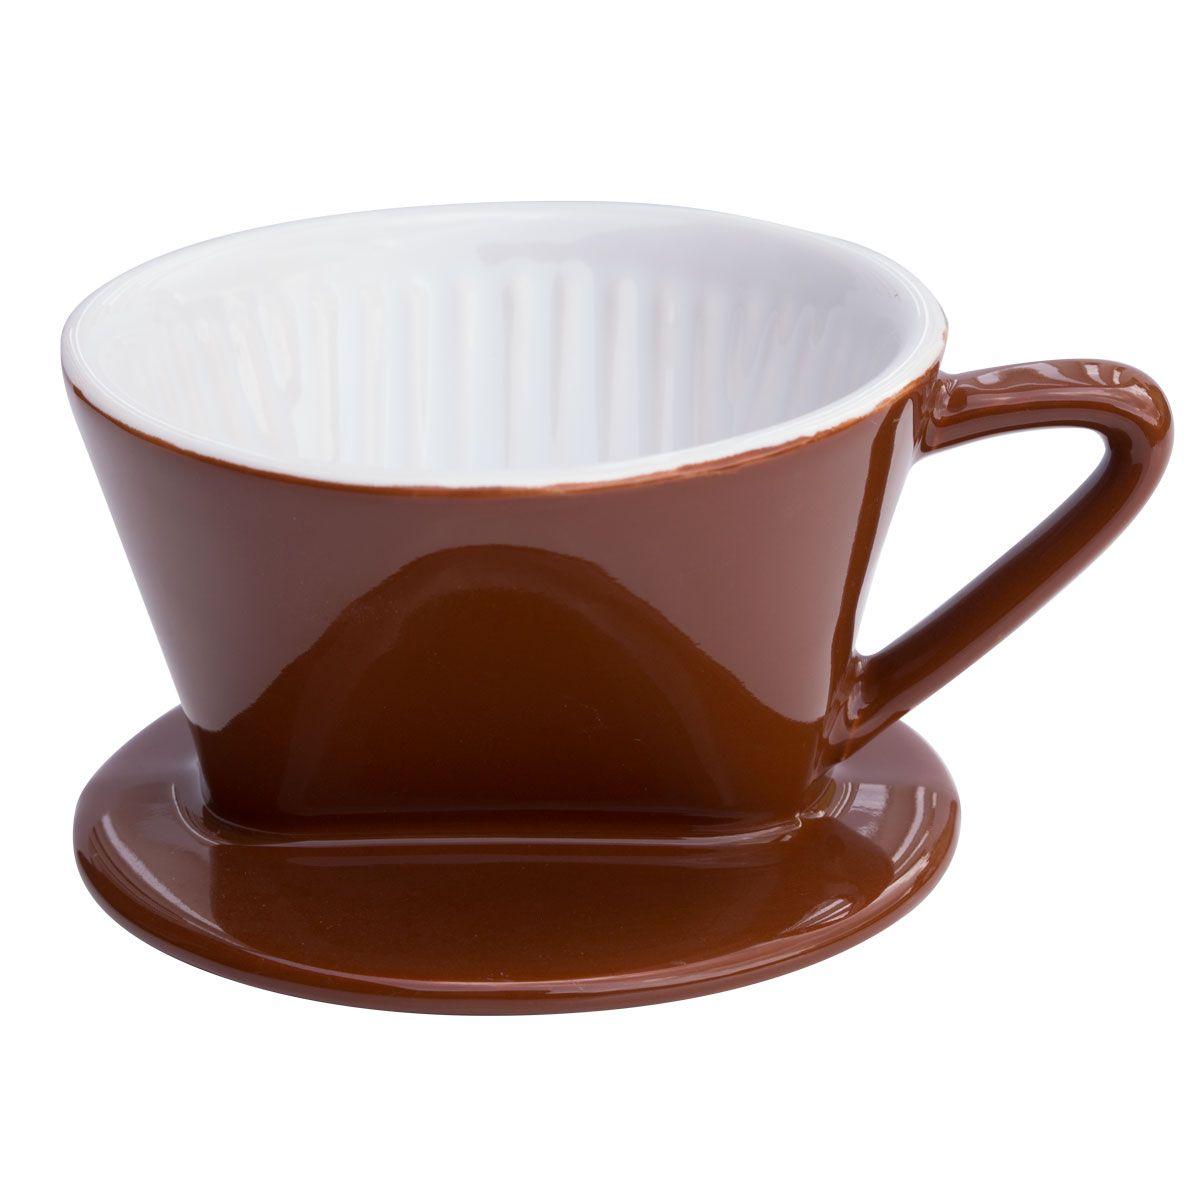 cilio kaffeefilter porzellan gr e 1 marone porzellanfilter kaffeebereiter. Black Bedroom Furniture Sets. Home Design Ideas